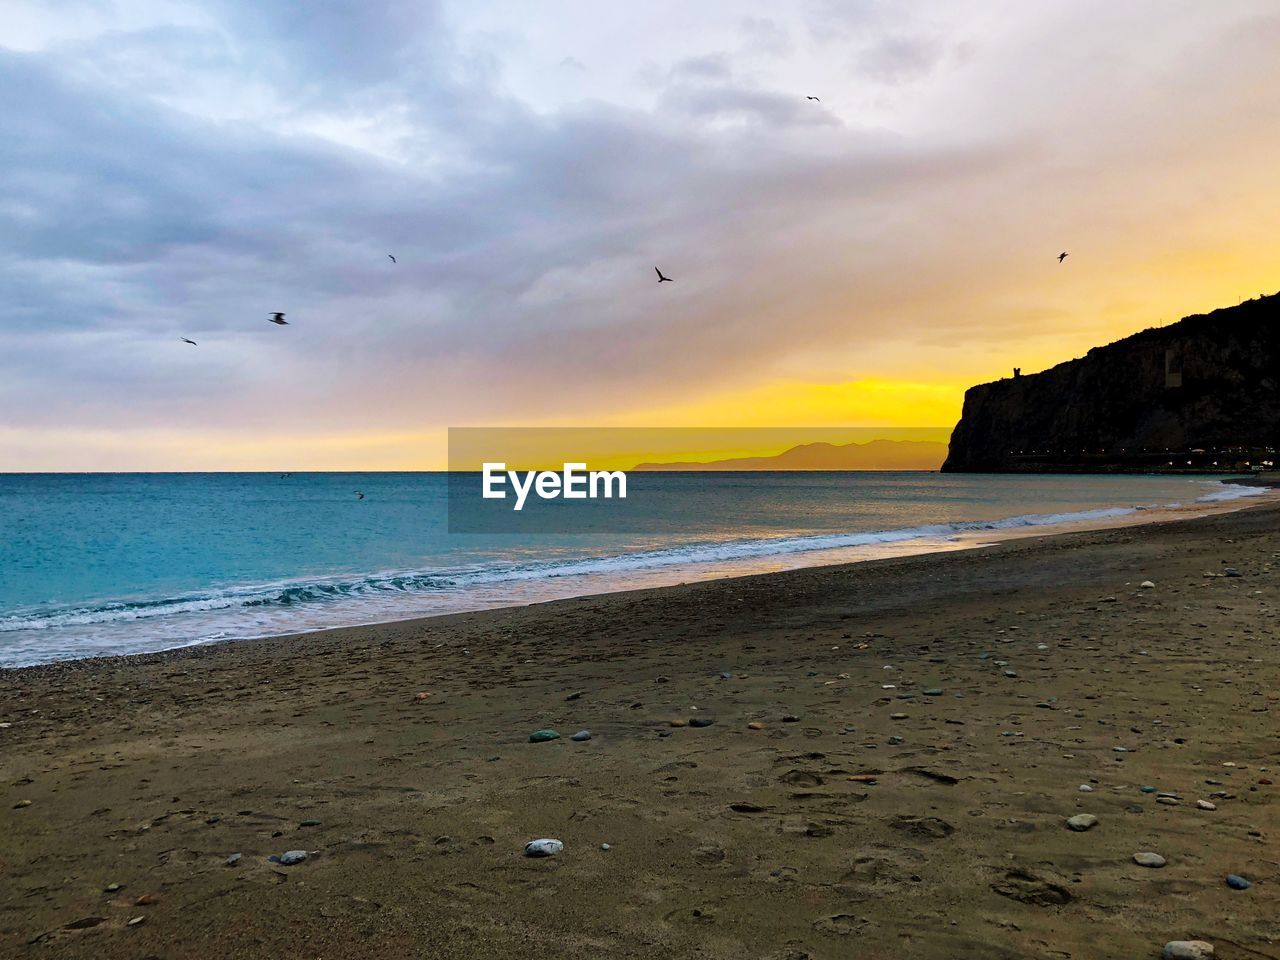 water, sea, beach, sky, land, cloud - sky, sand, beauty in nature, horizon, sunset, horizon over water, scenics - nature, tranquility, tranquil scene, nature, idyllic, bird, no people, outdoors